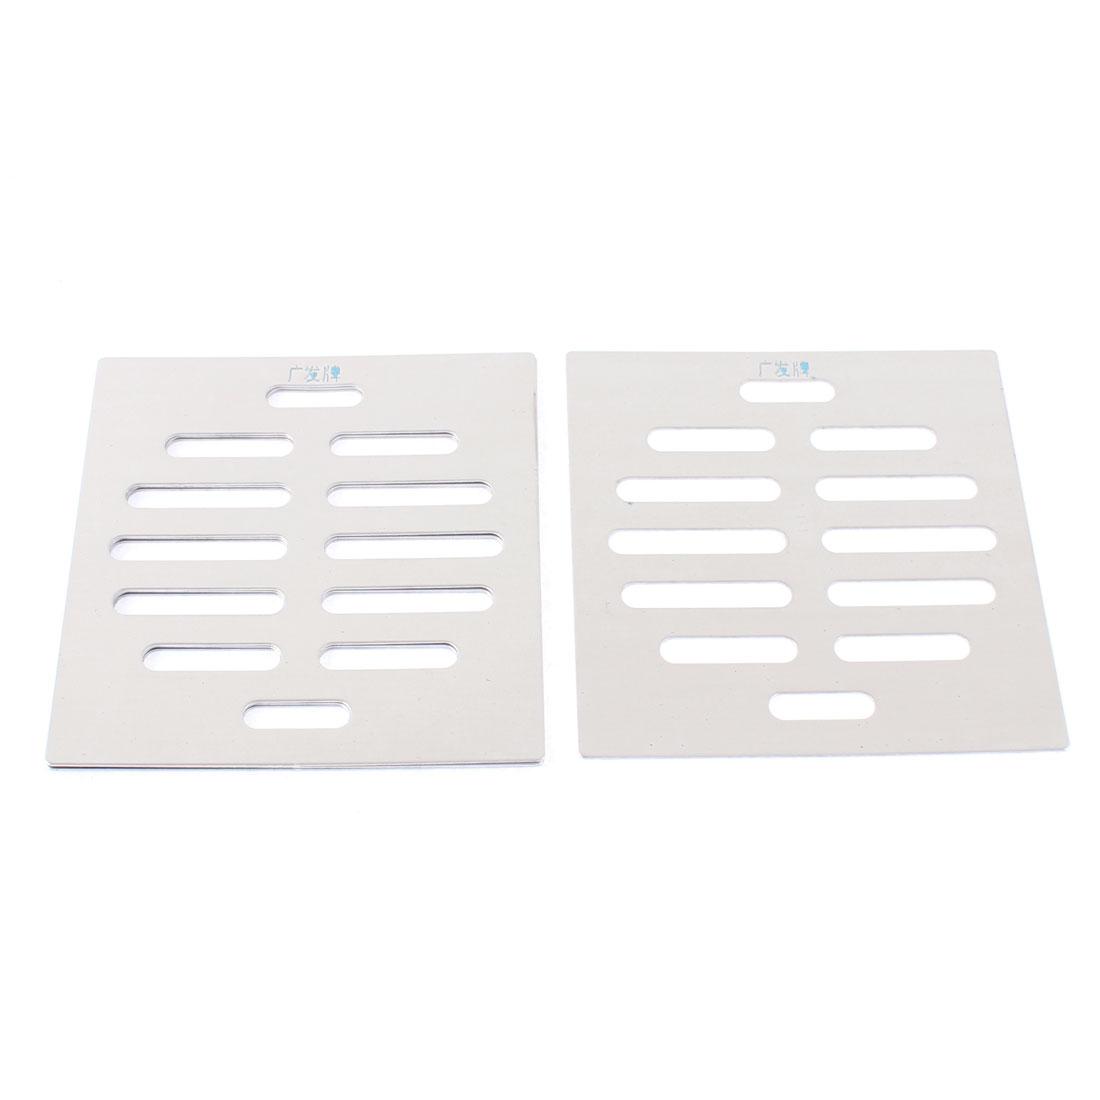 "Stainless Steel Kitchen Bathroom Square Floor Drain Cover 4"" 10cm 4pcs"